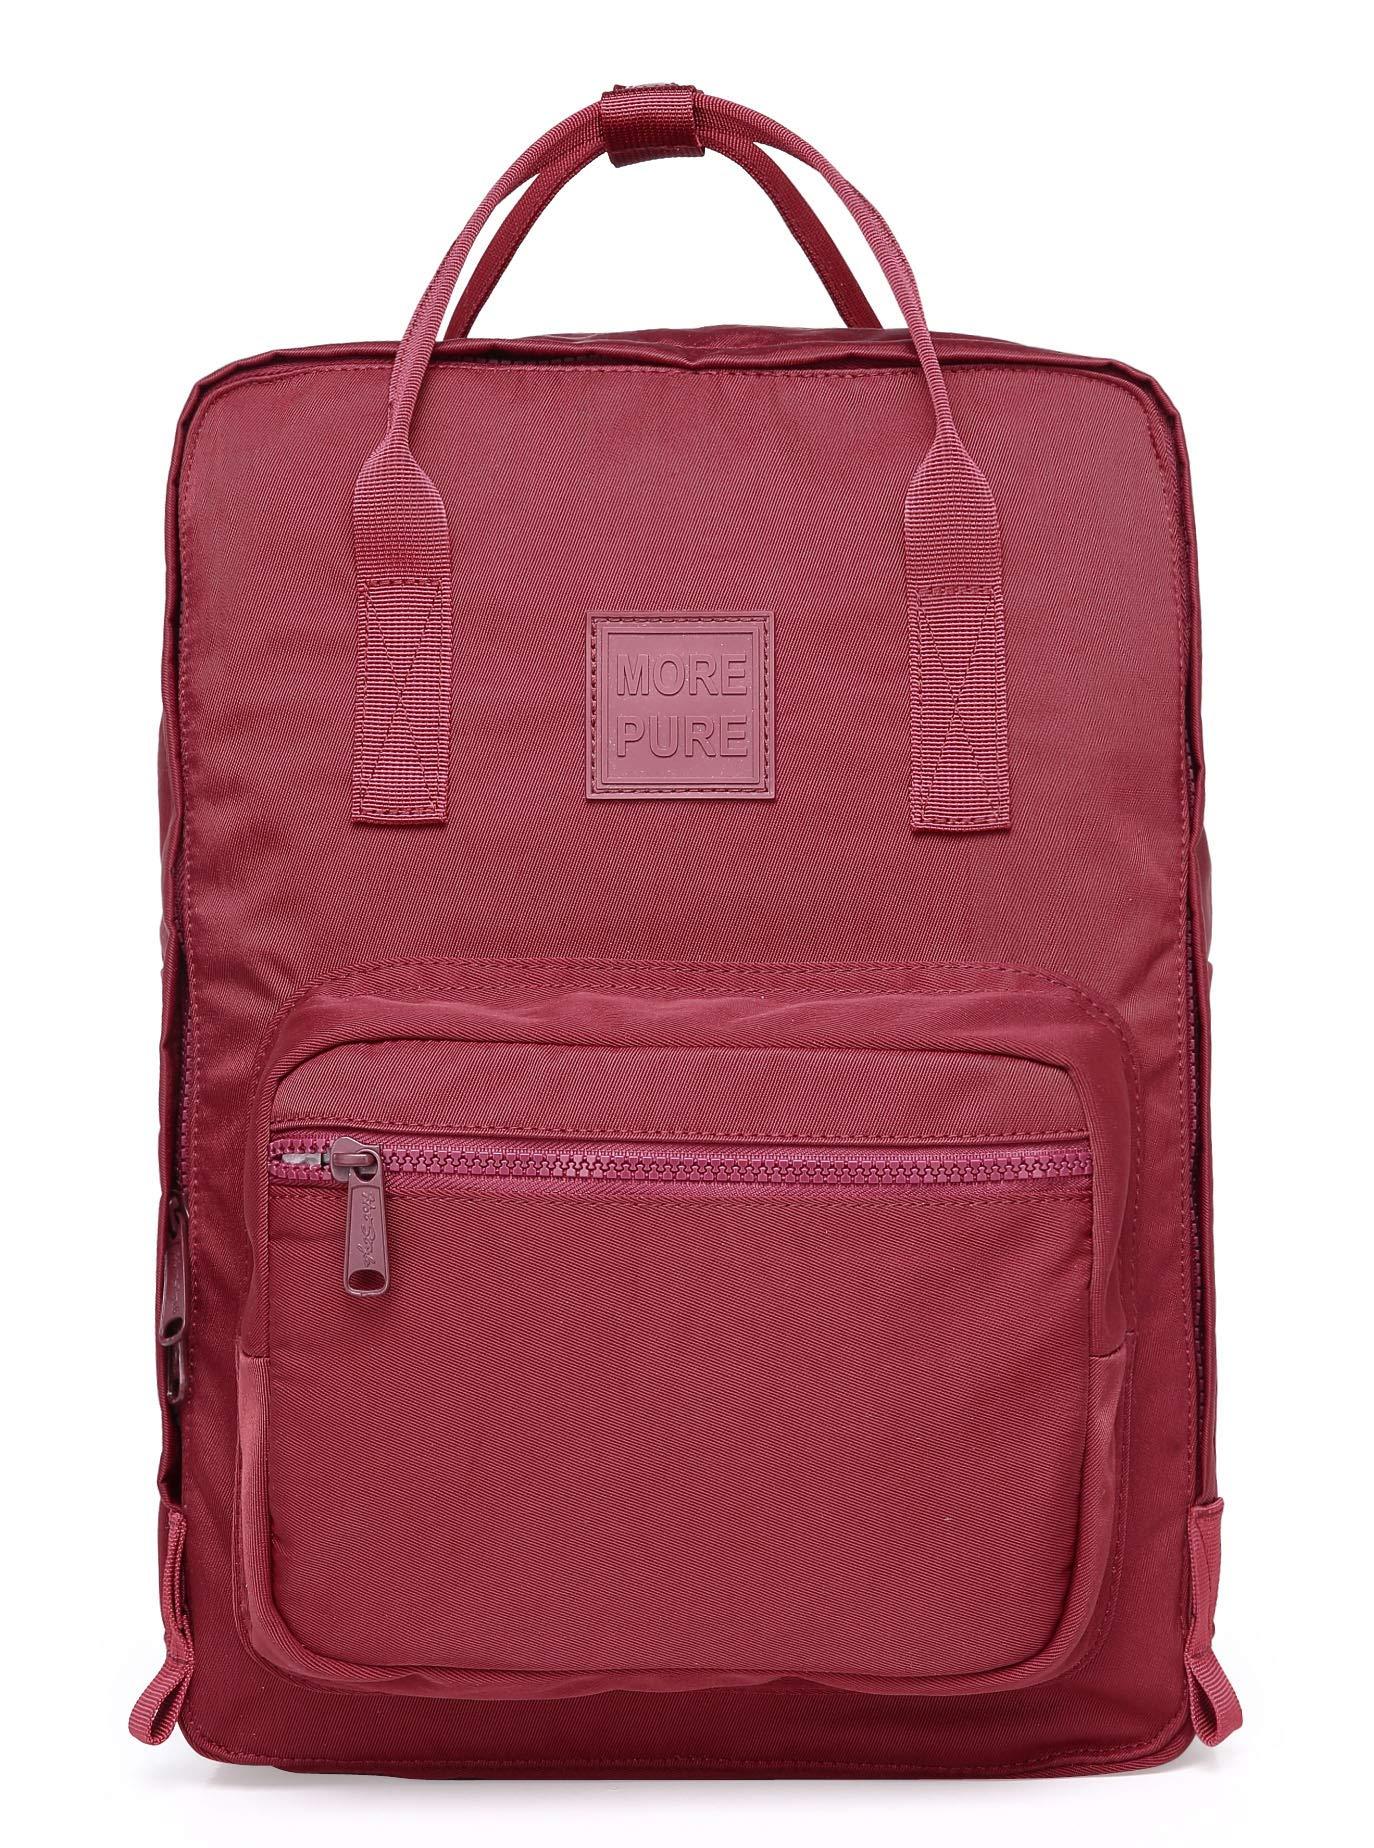 MOREPURE 233s Lightweight Travel Backpack | Fits 15-inch MacBook | 14.5''x10.6''x4.7'' | Marron